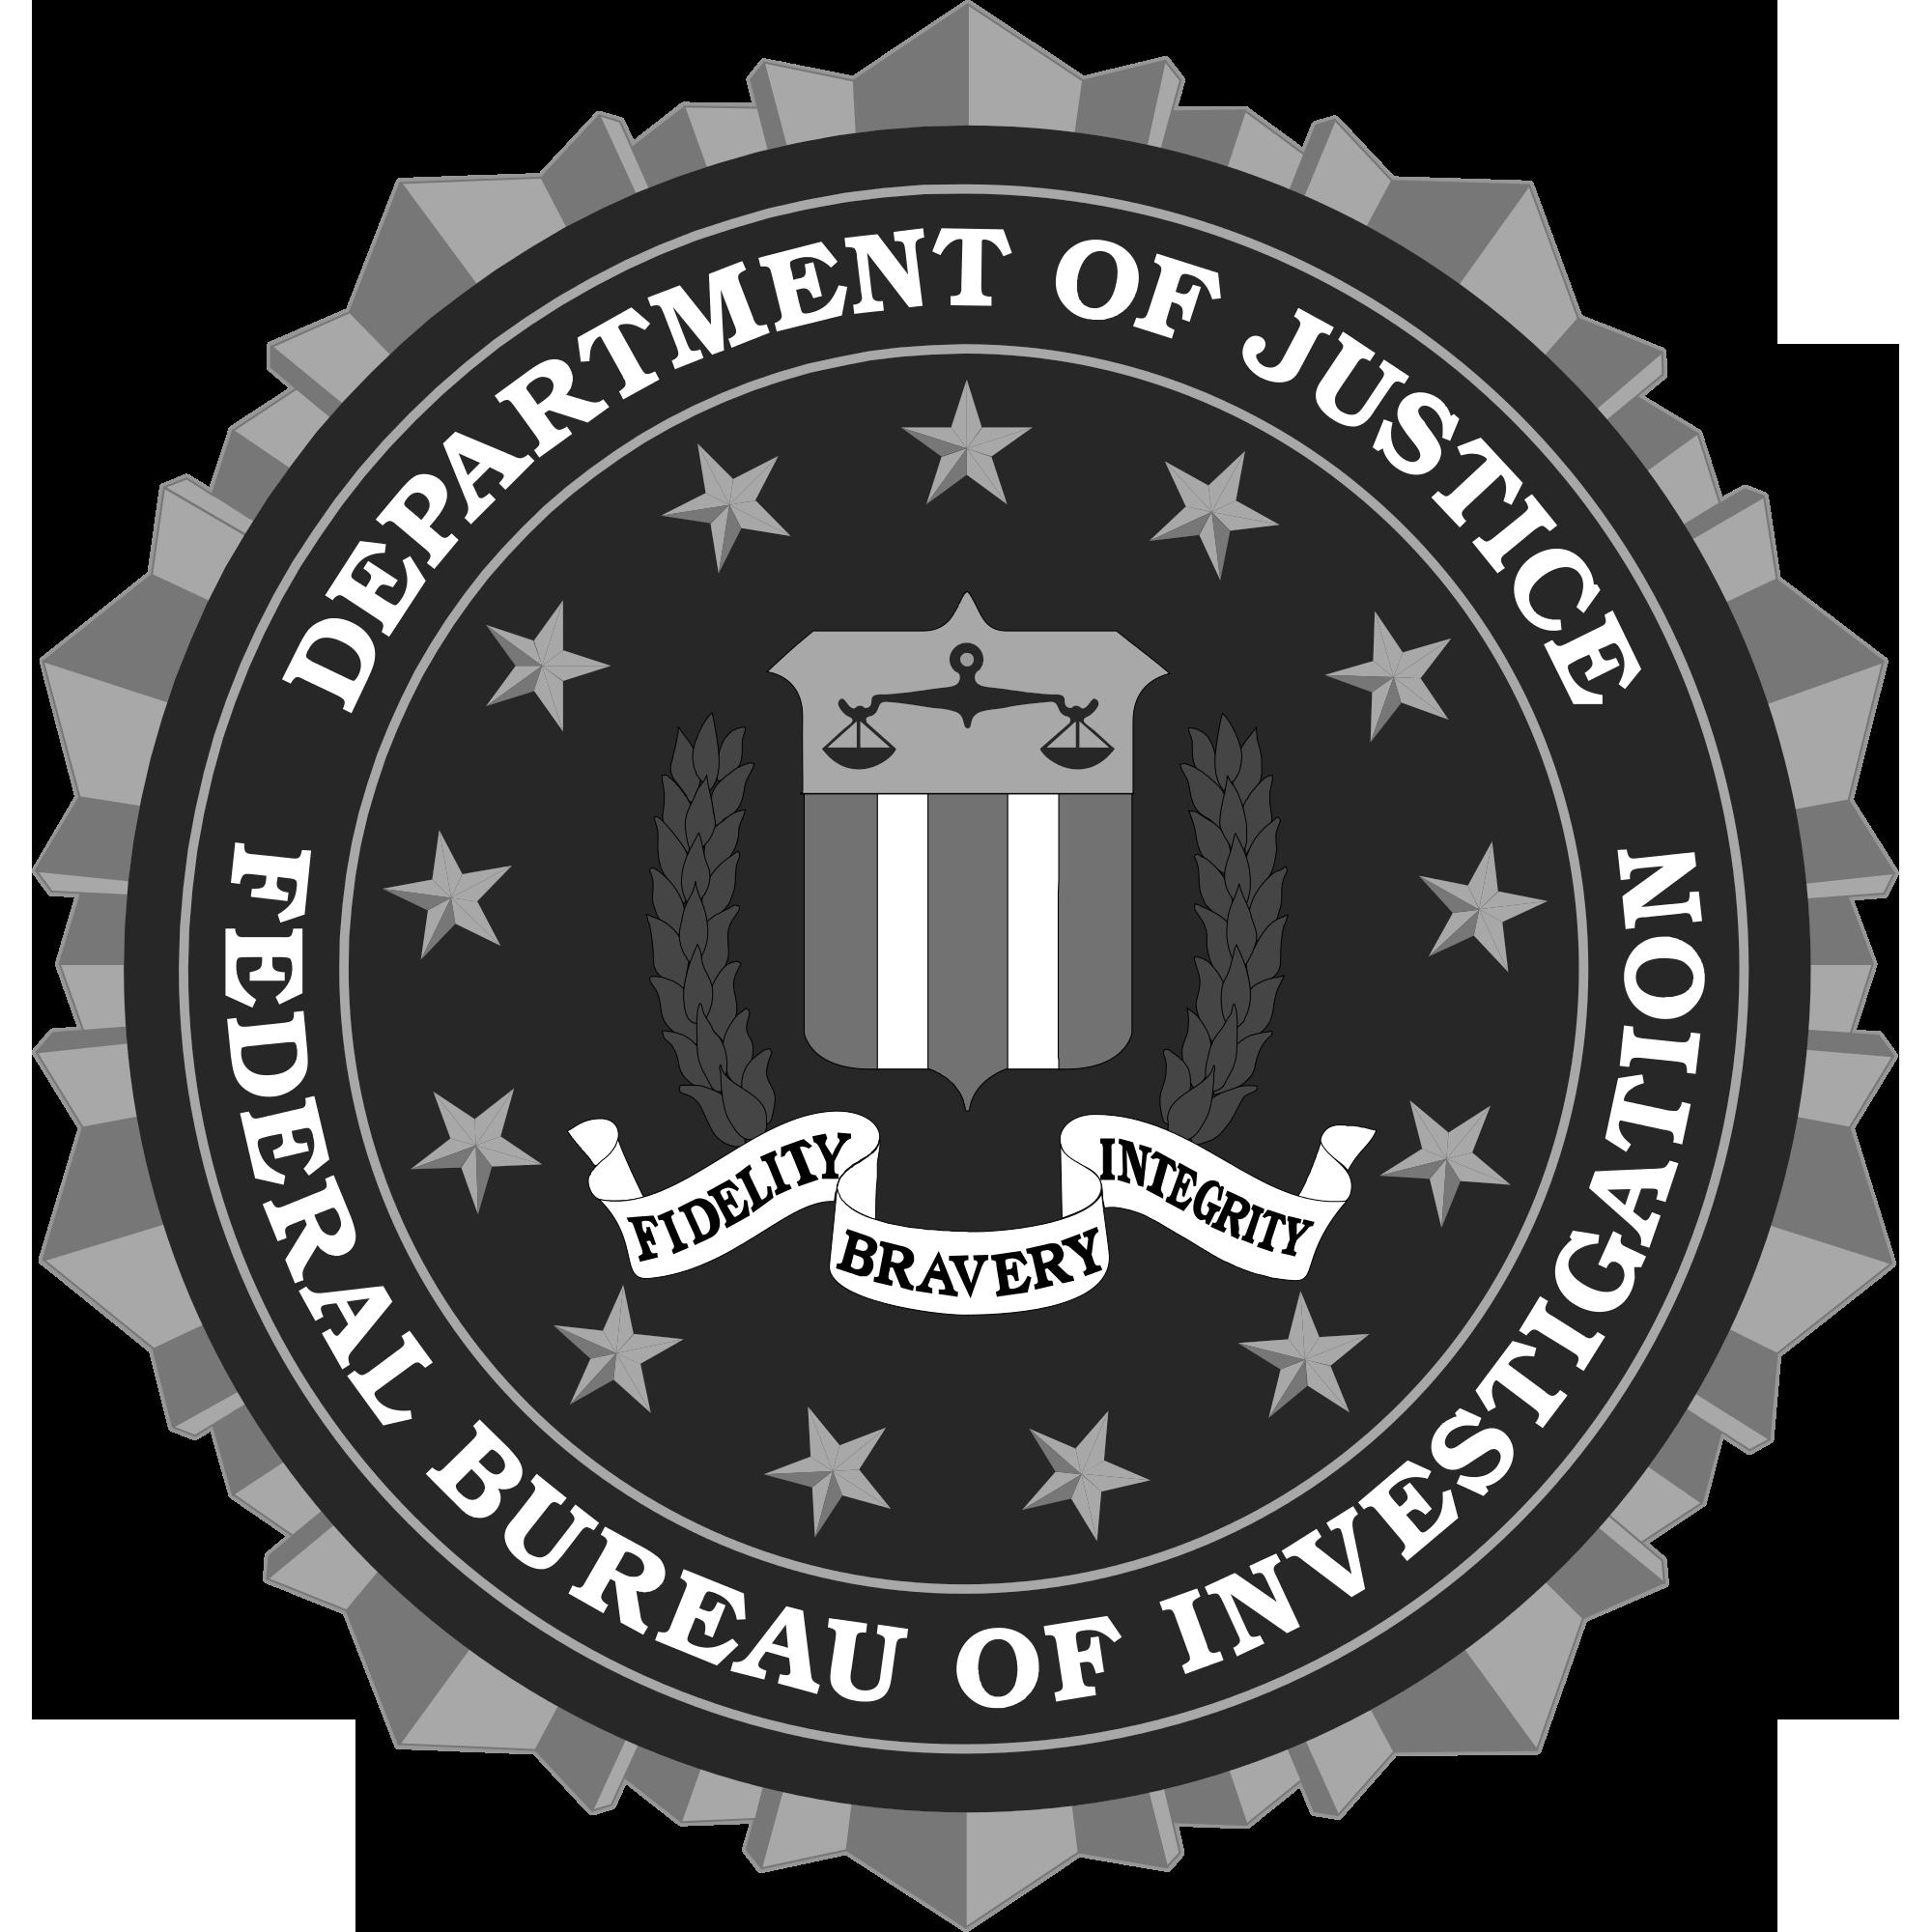 Federal Bureau of Investigation (FBI) copy